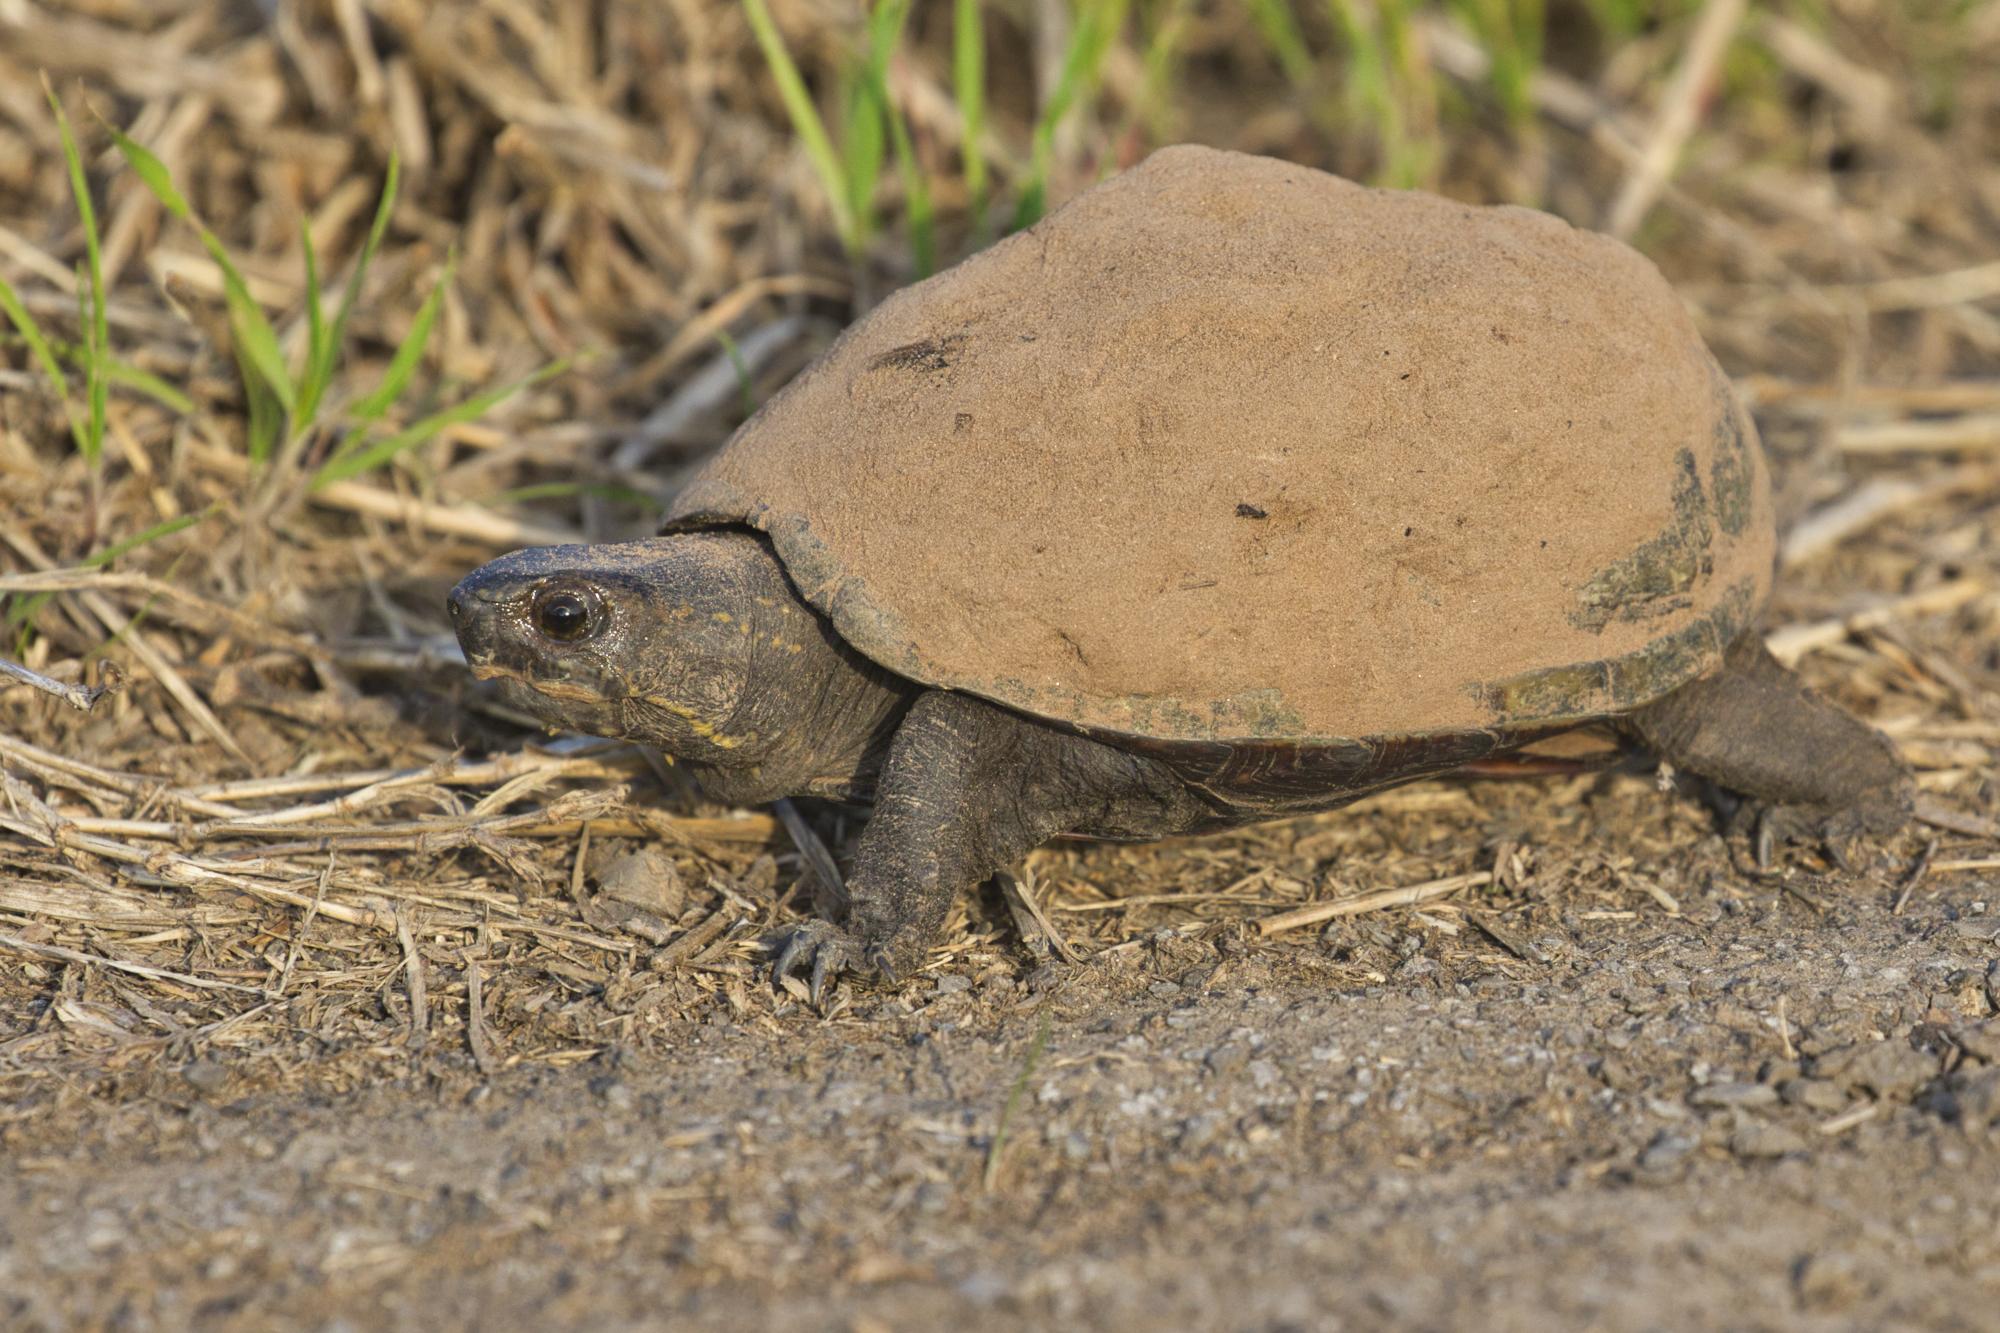 Mississippi Mud Turtle - Sequoyah National Wildlife Refuge - Oklahoma